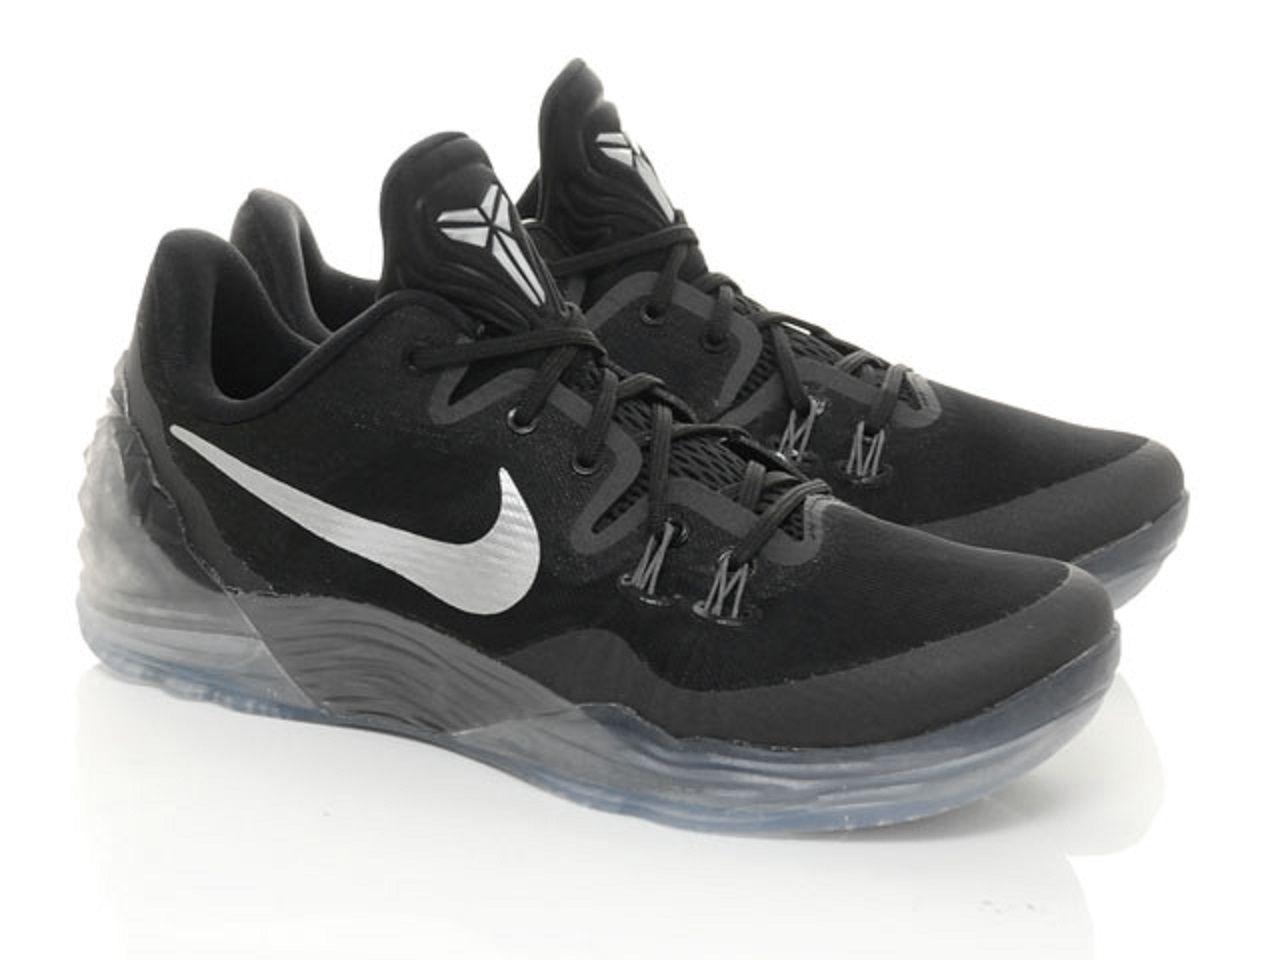 nike zoom kobe venomenon 5 ep limit black basketball shoes